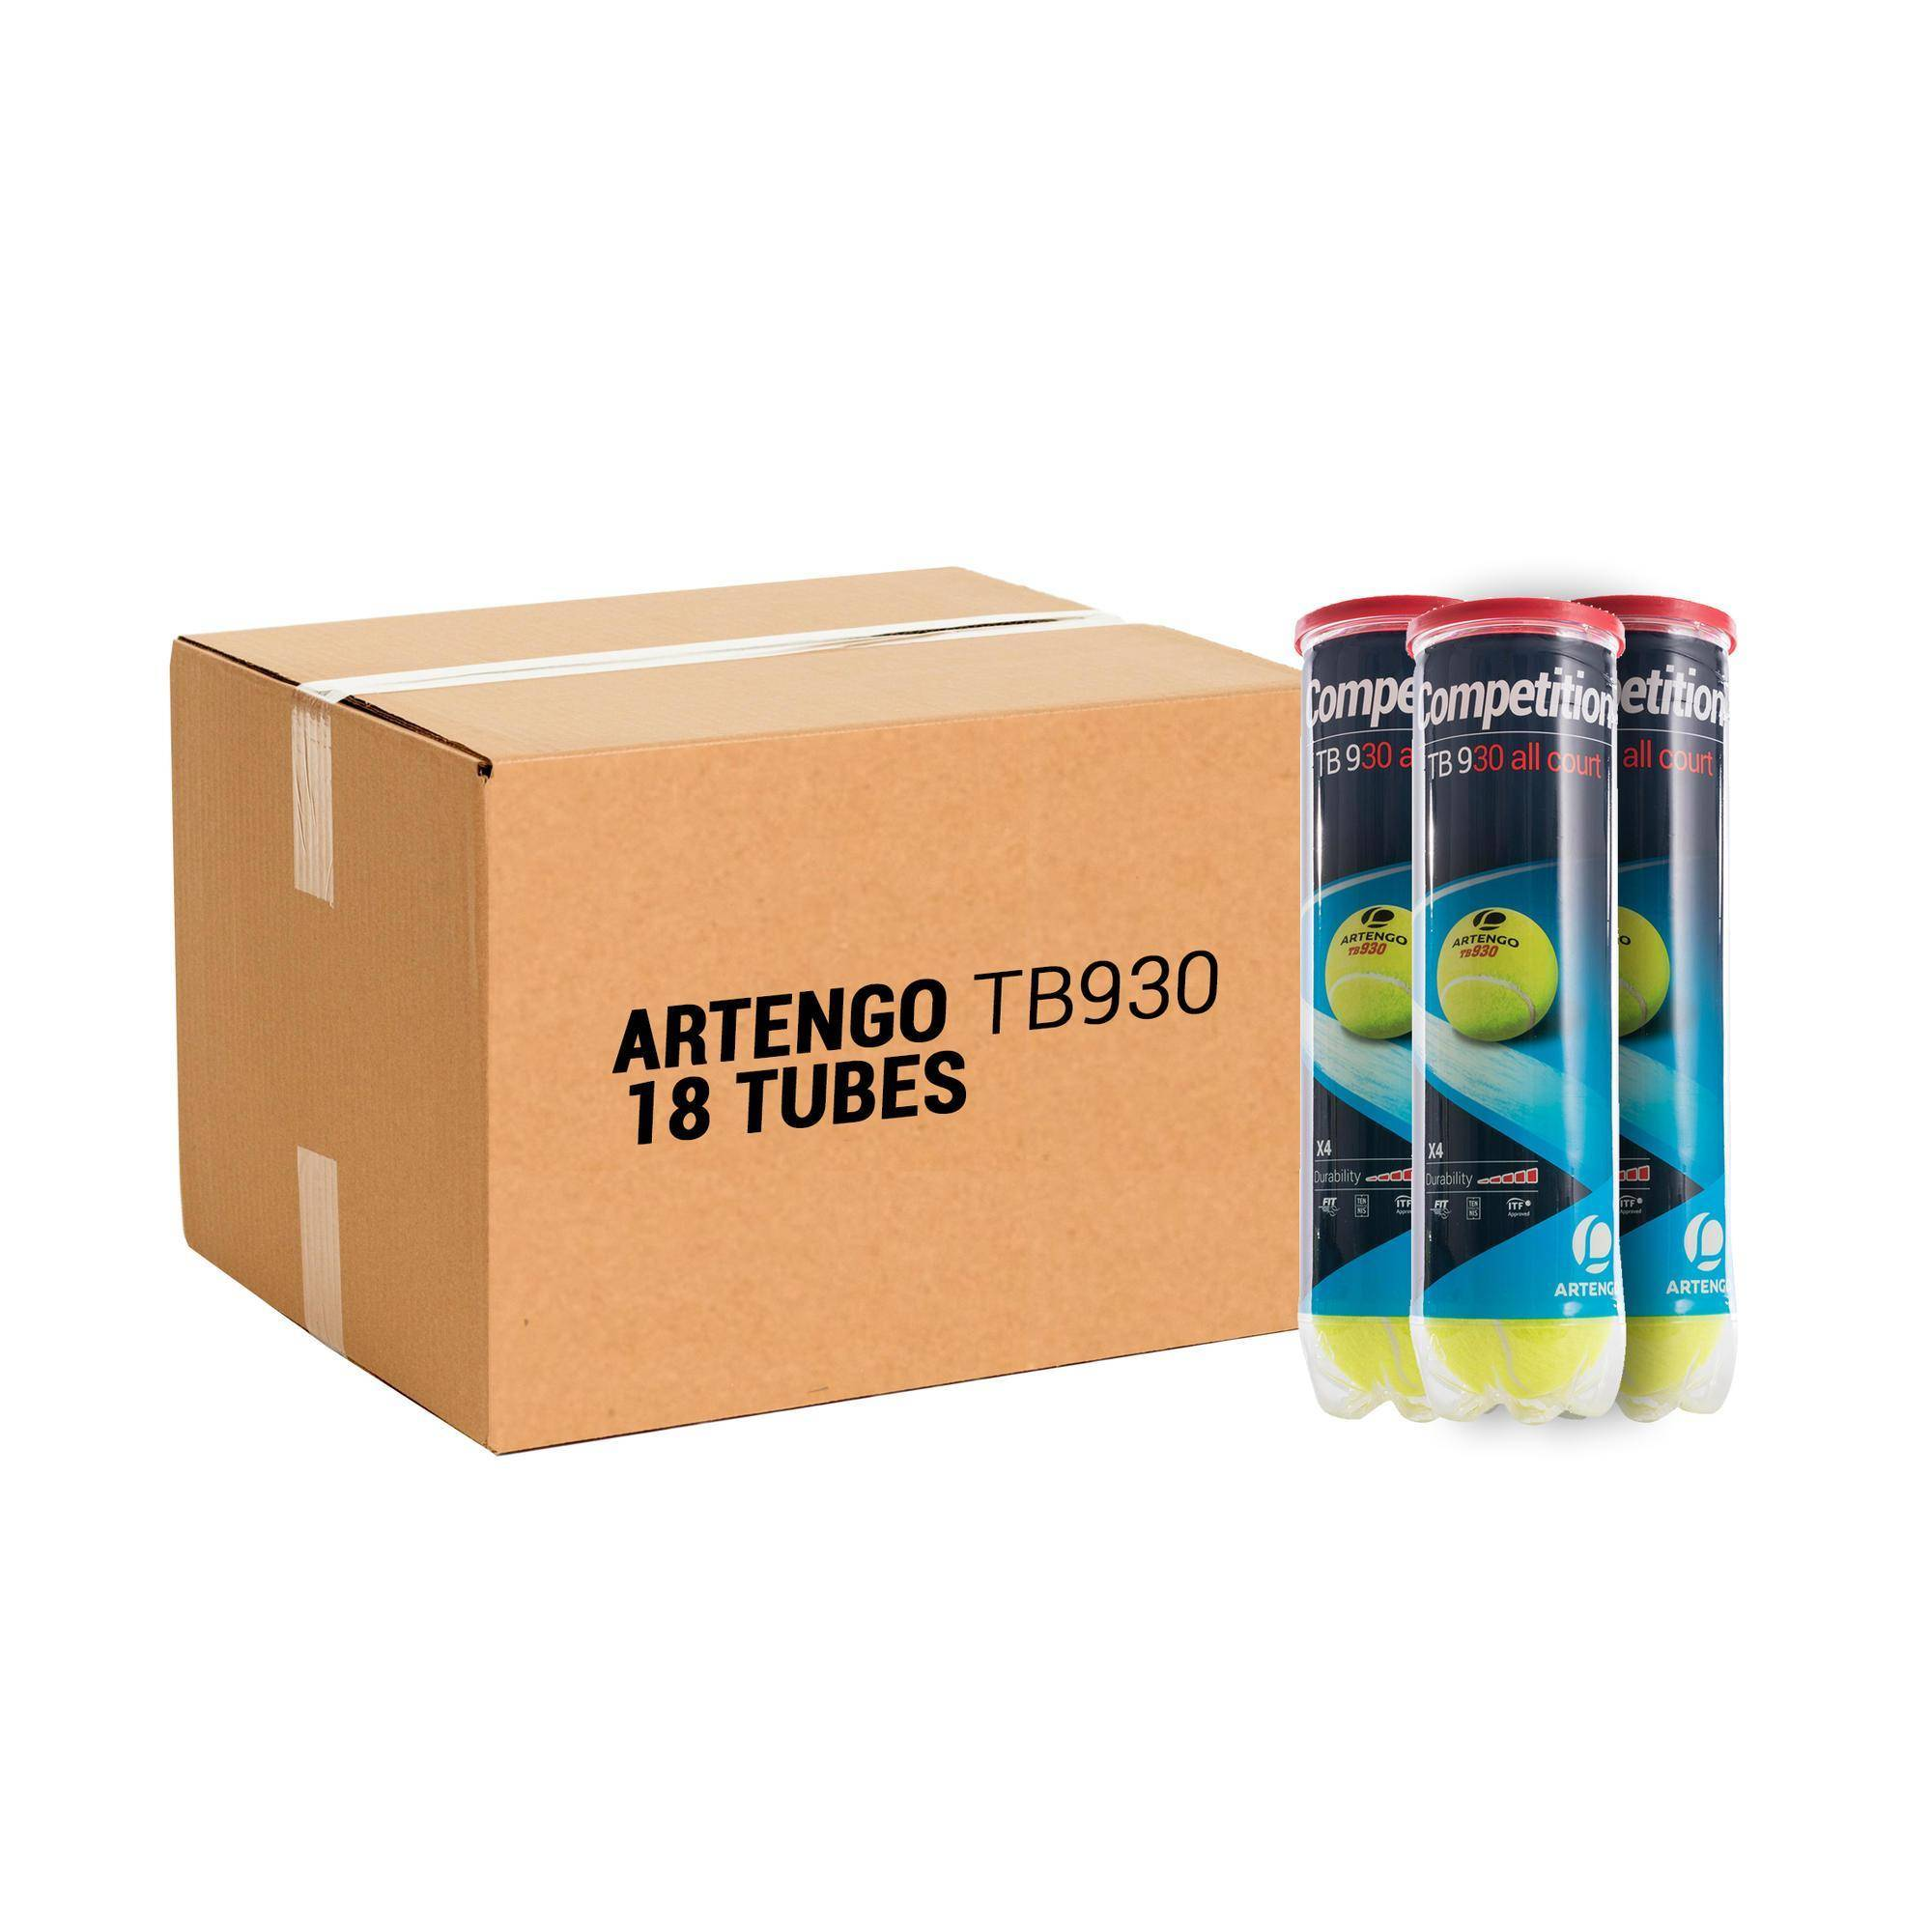 ARTENGO BALLE DE TENNIS TB930 *4 PACK *18 JAUNE - ARTENGO - Taille unique